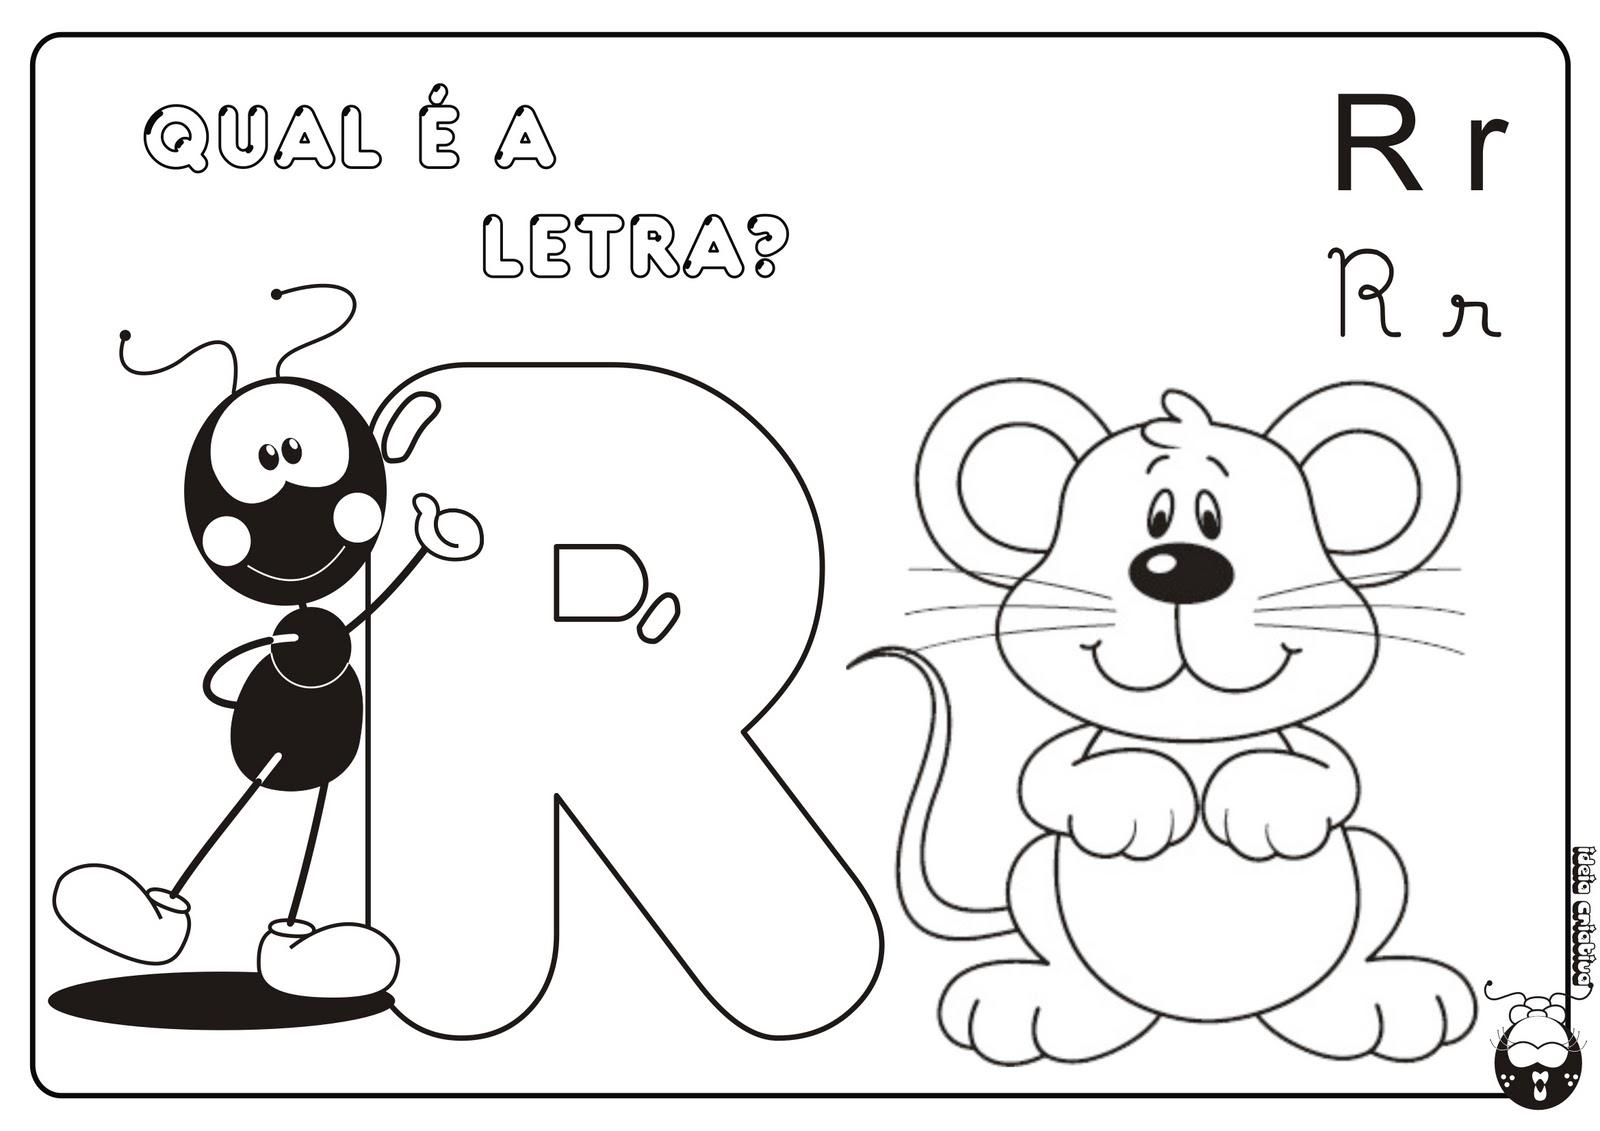 Alfabeto Smilinguido 4 tipos de letra para Baixar Grátis Letra r